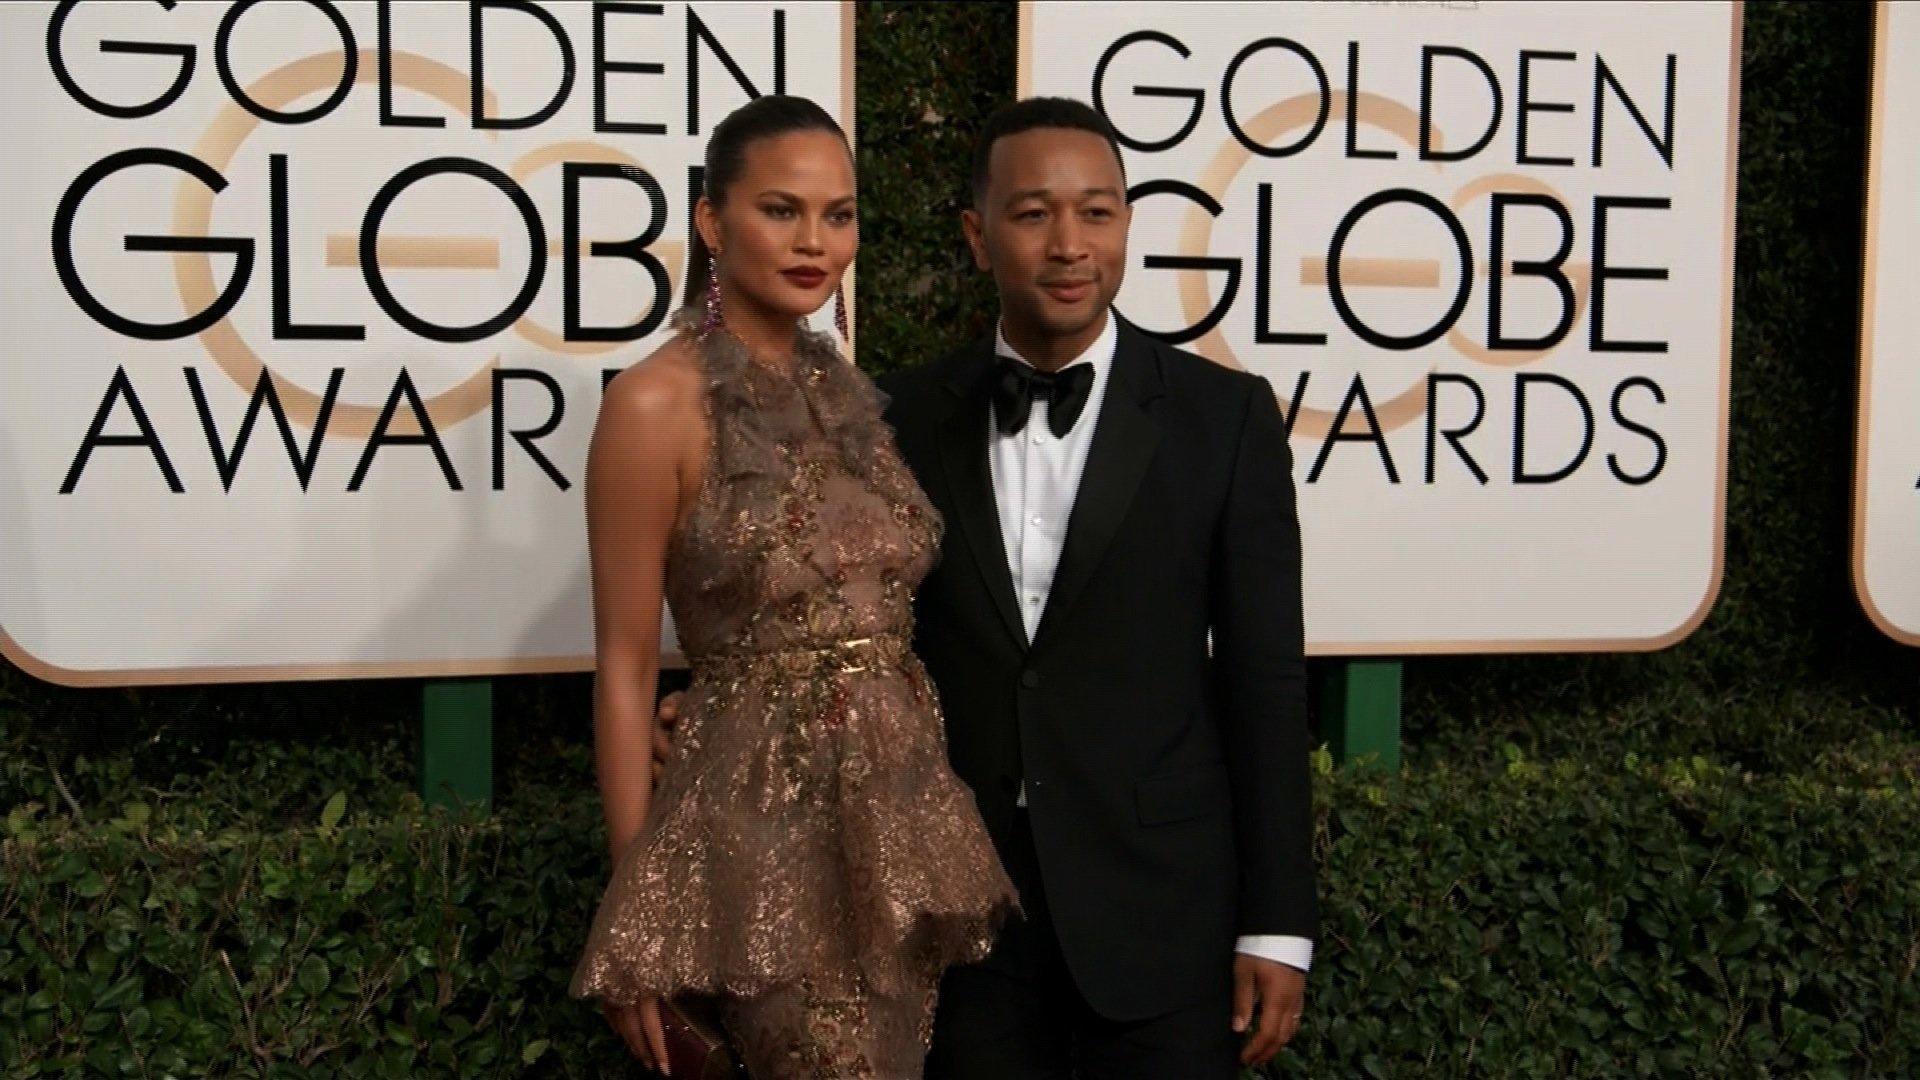 Chrissy Teigen and John Legend at the 74th annual Golden Globe Awards.